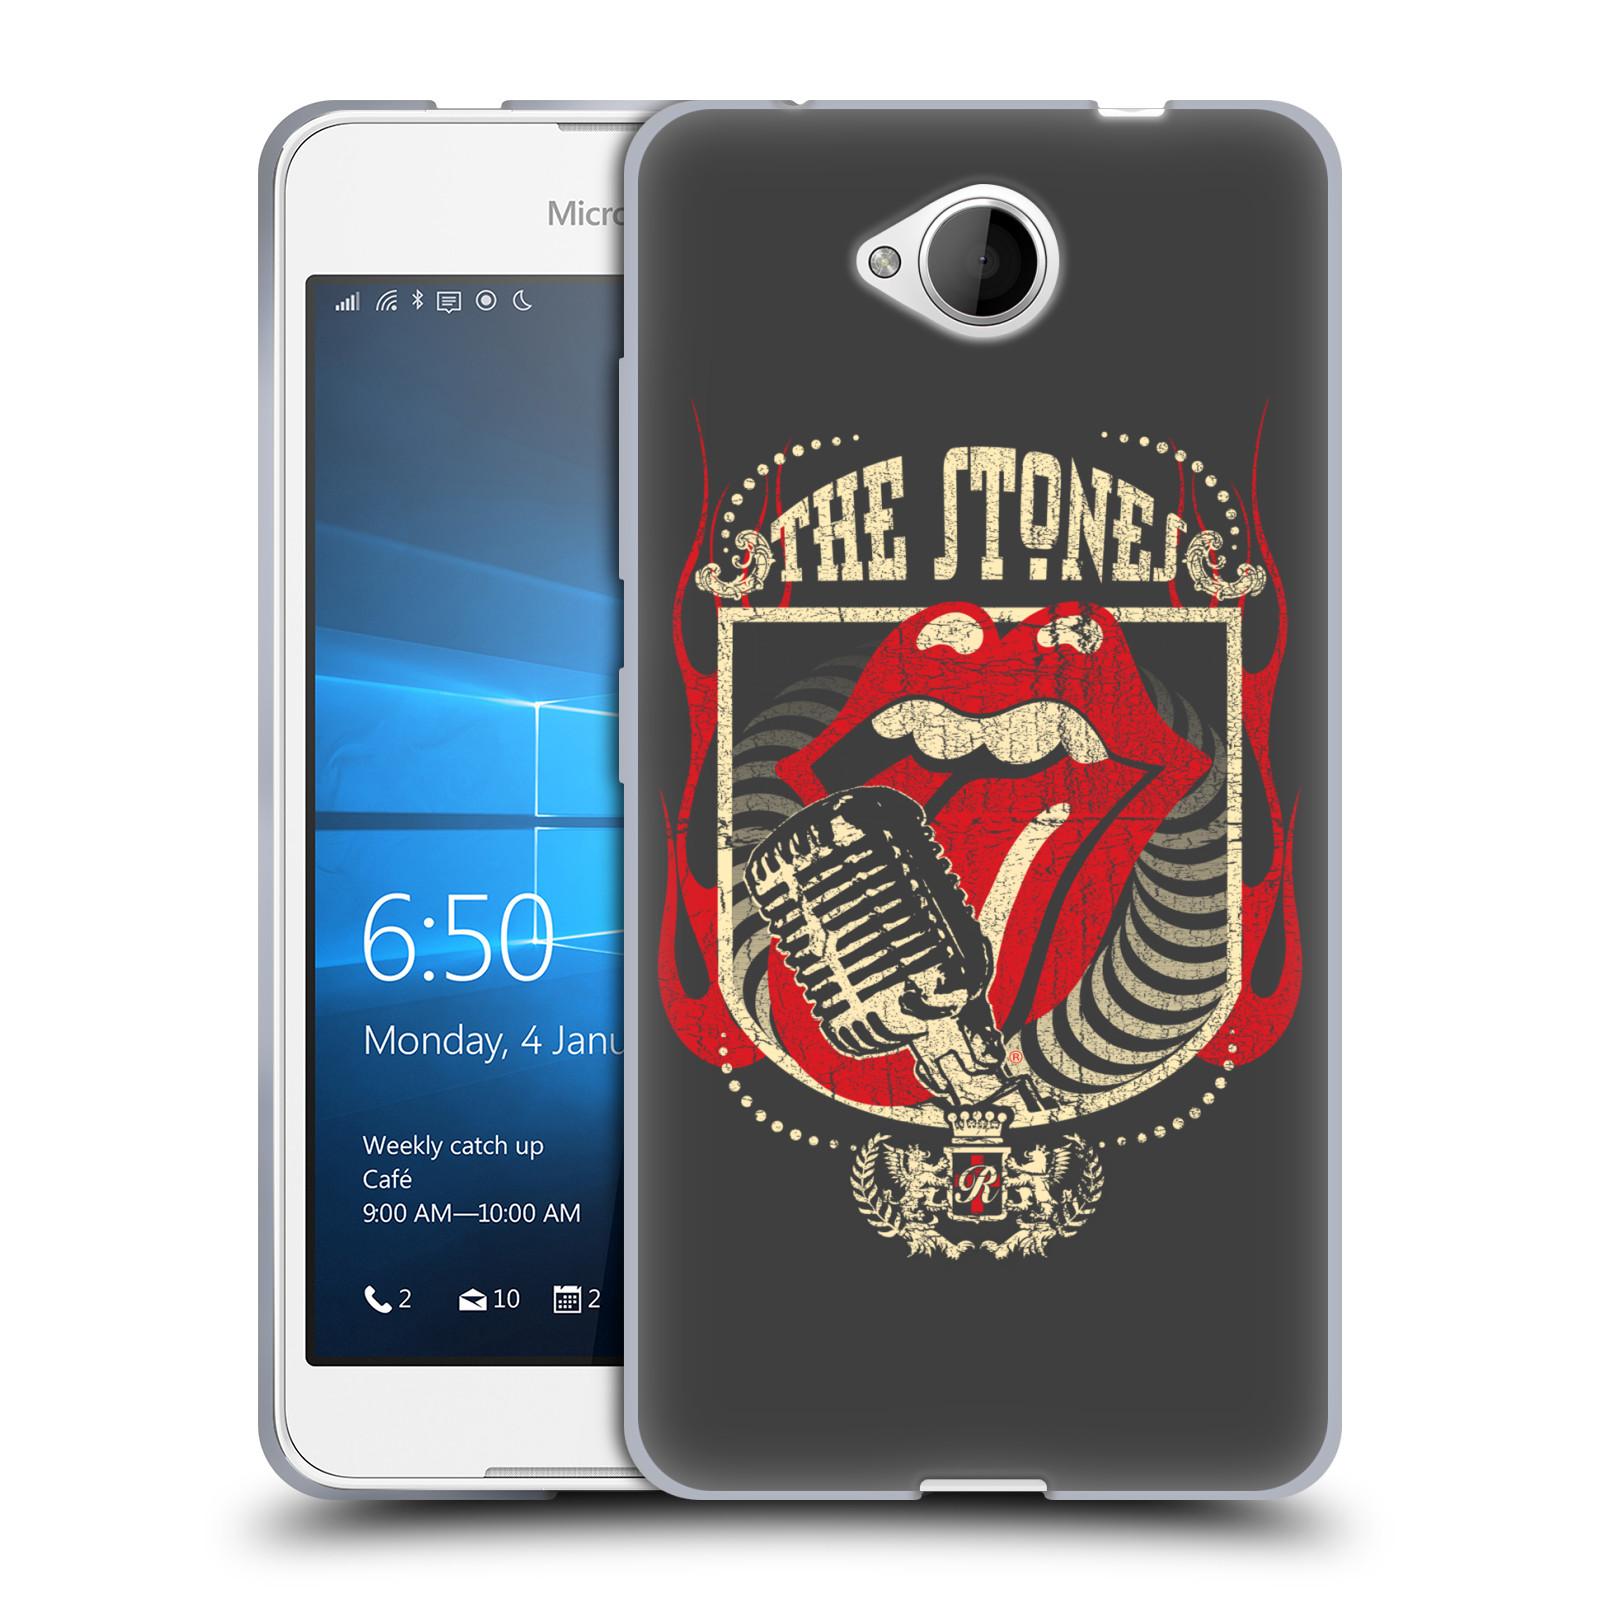 Silikonové pouzdro na mobil Microsoft Lumia 650 HEAD CASE The Rolling Stones - Mikrák (Silikonový kryt či obal The Rolling Stones Official na mobilní telefon Microsoft Lumia 650)